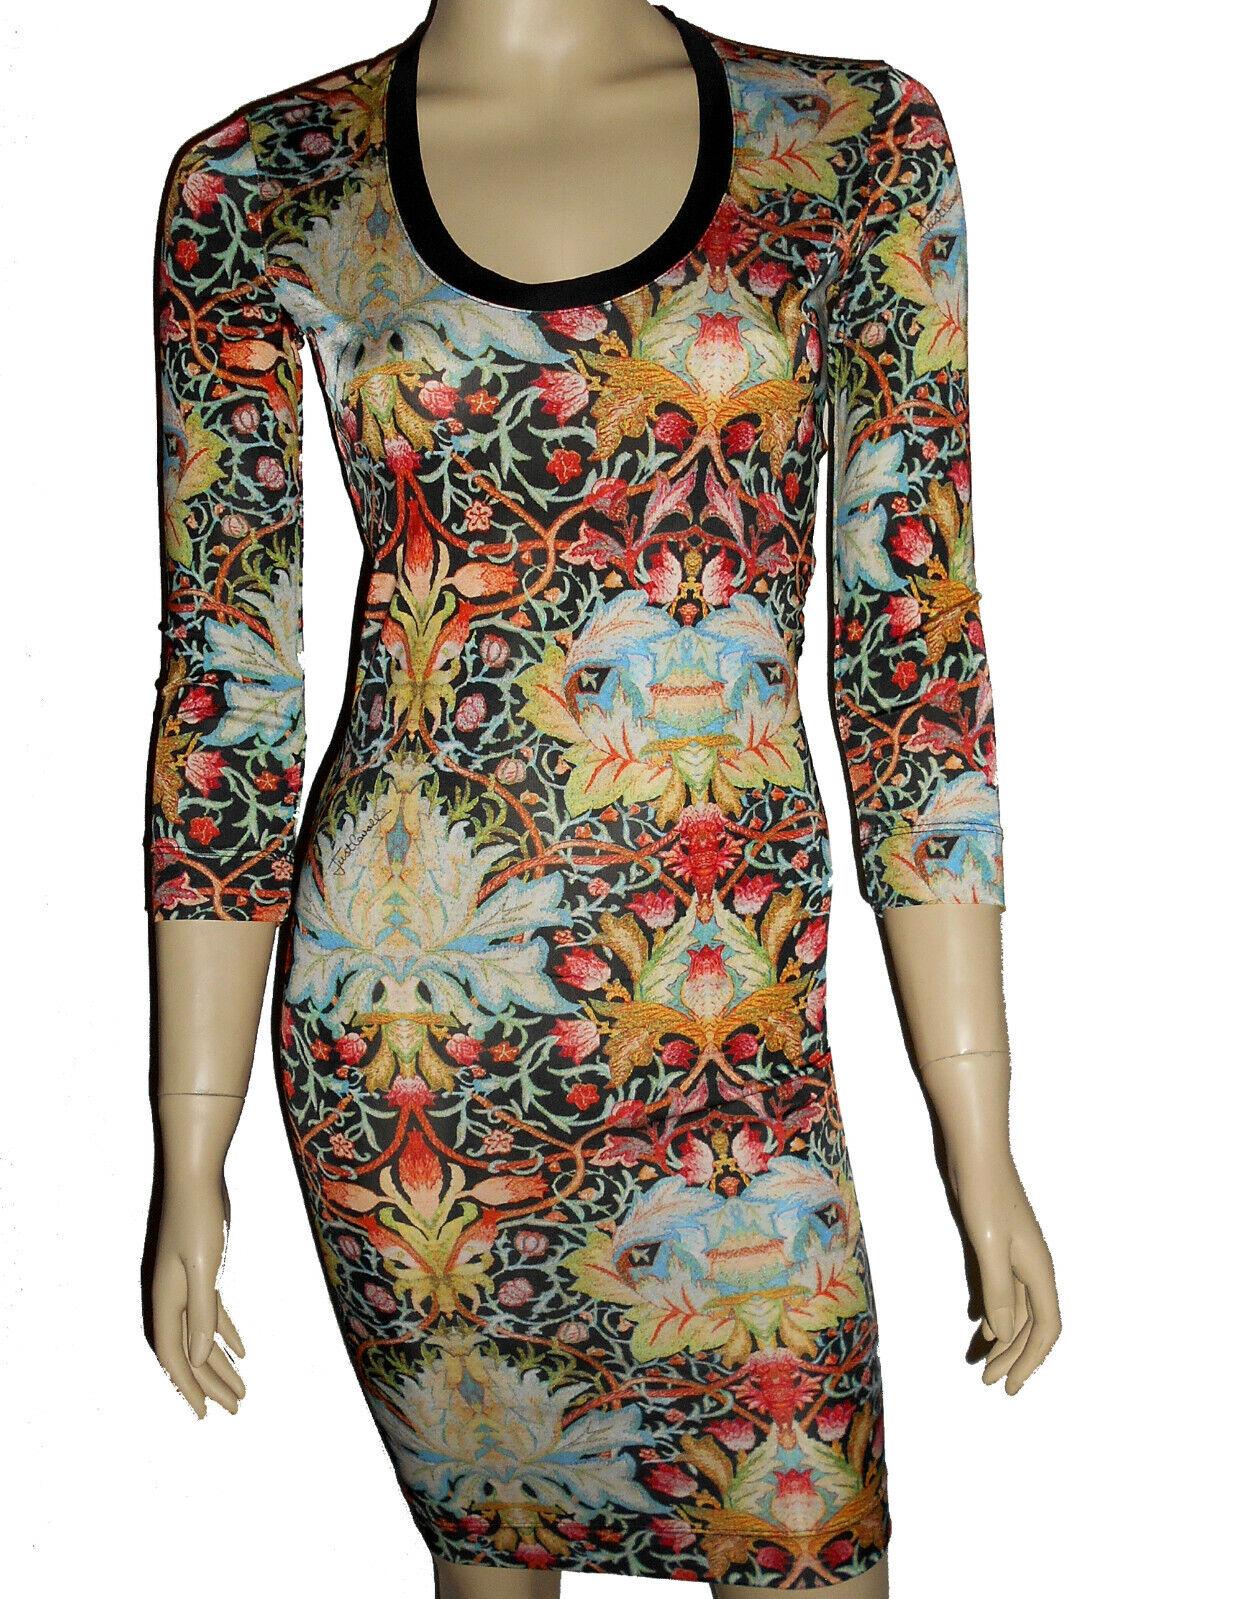 Just Cavalli 100% Viscose Robe Design Fleurs à Fleurs Boho de Luxe 32 34 S